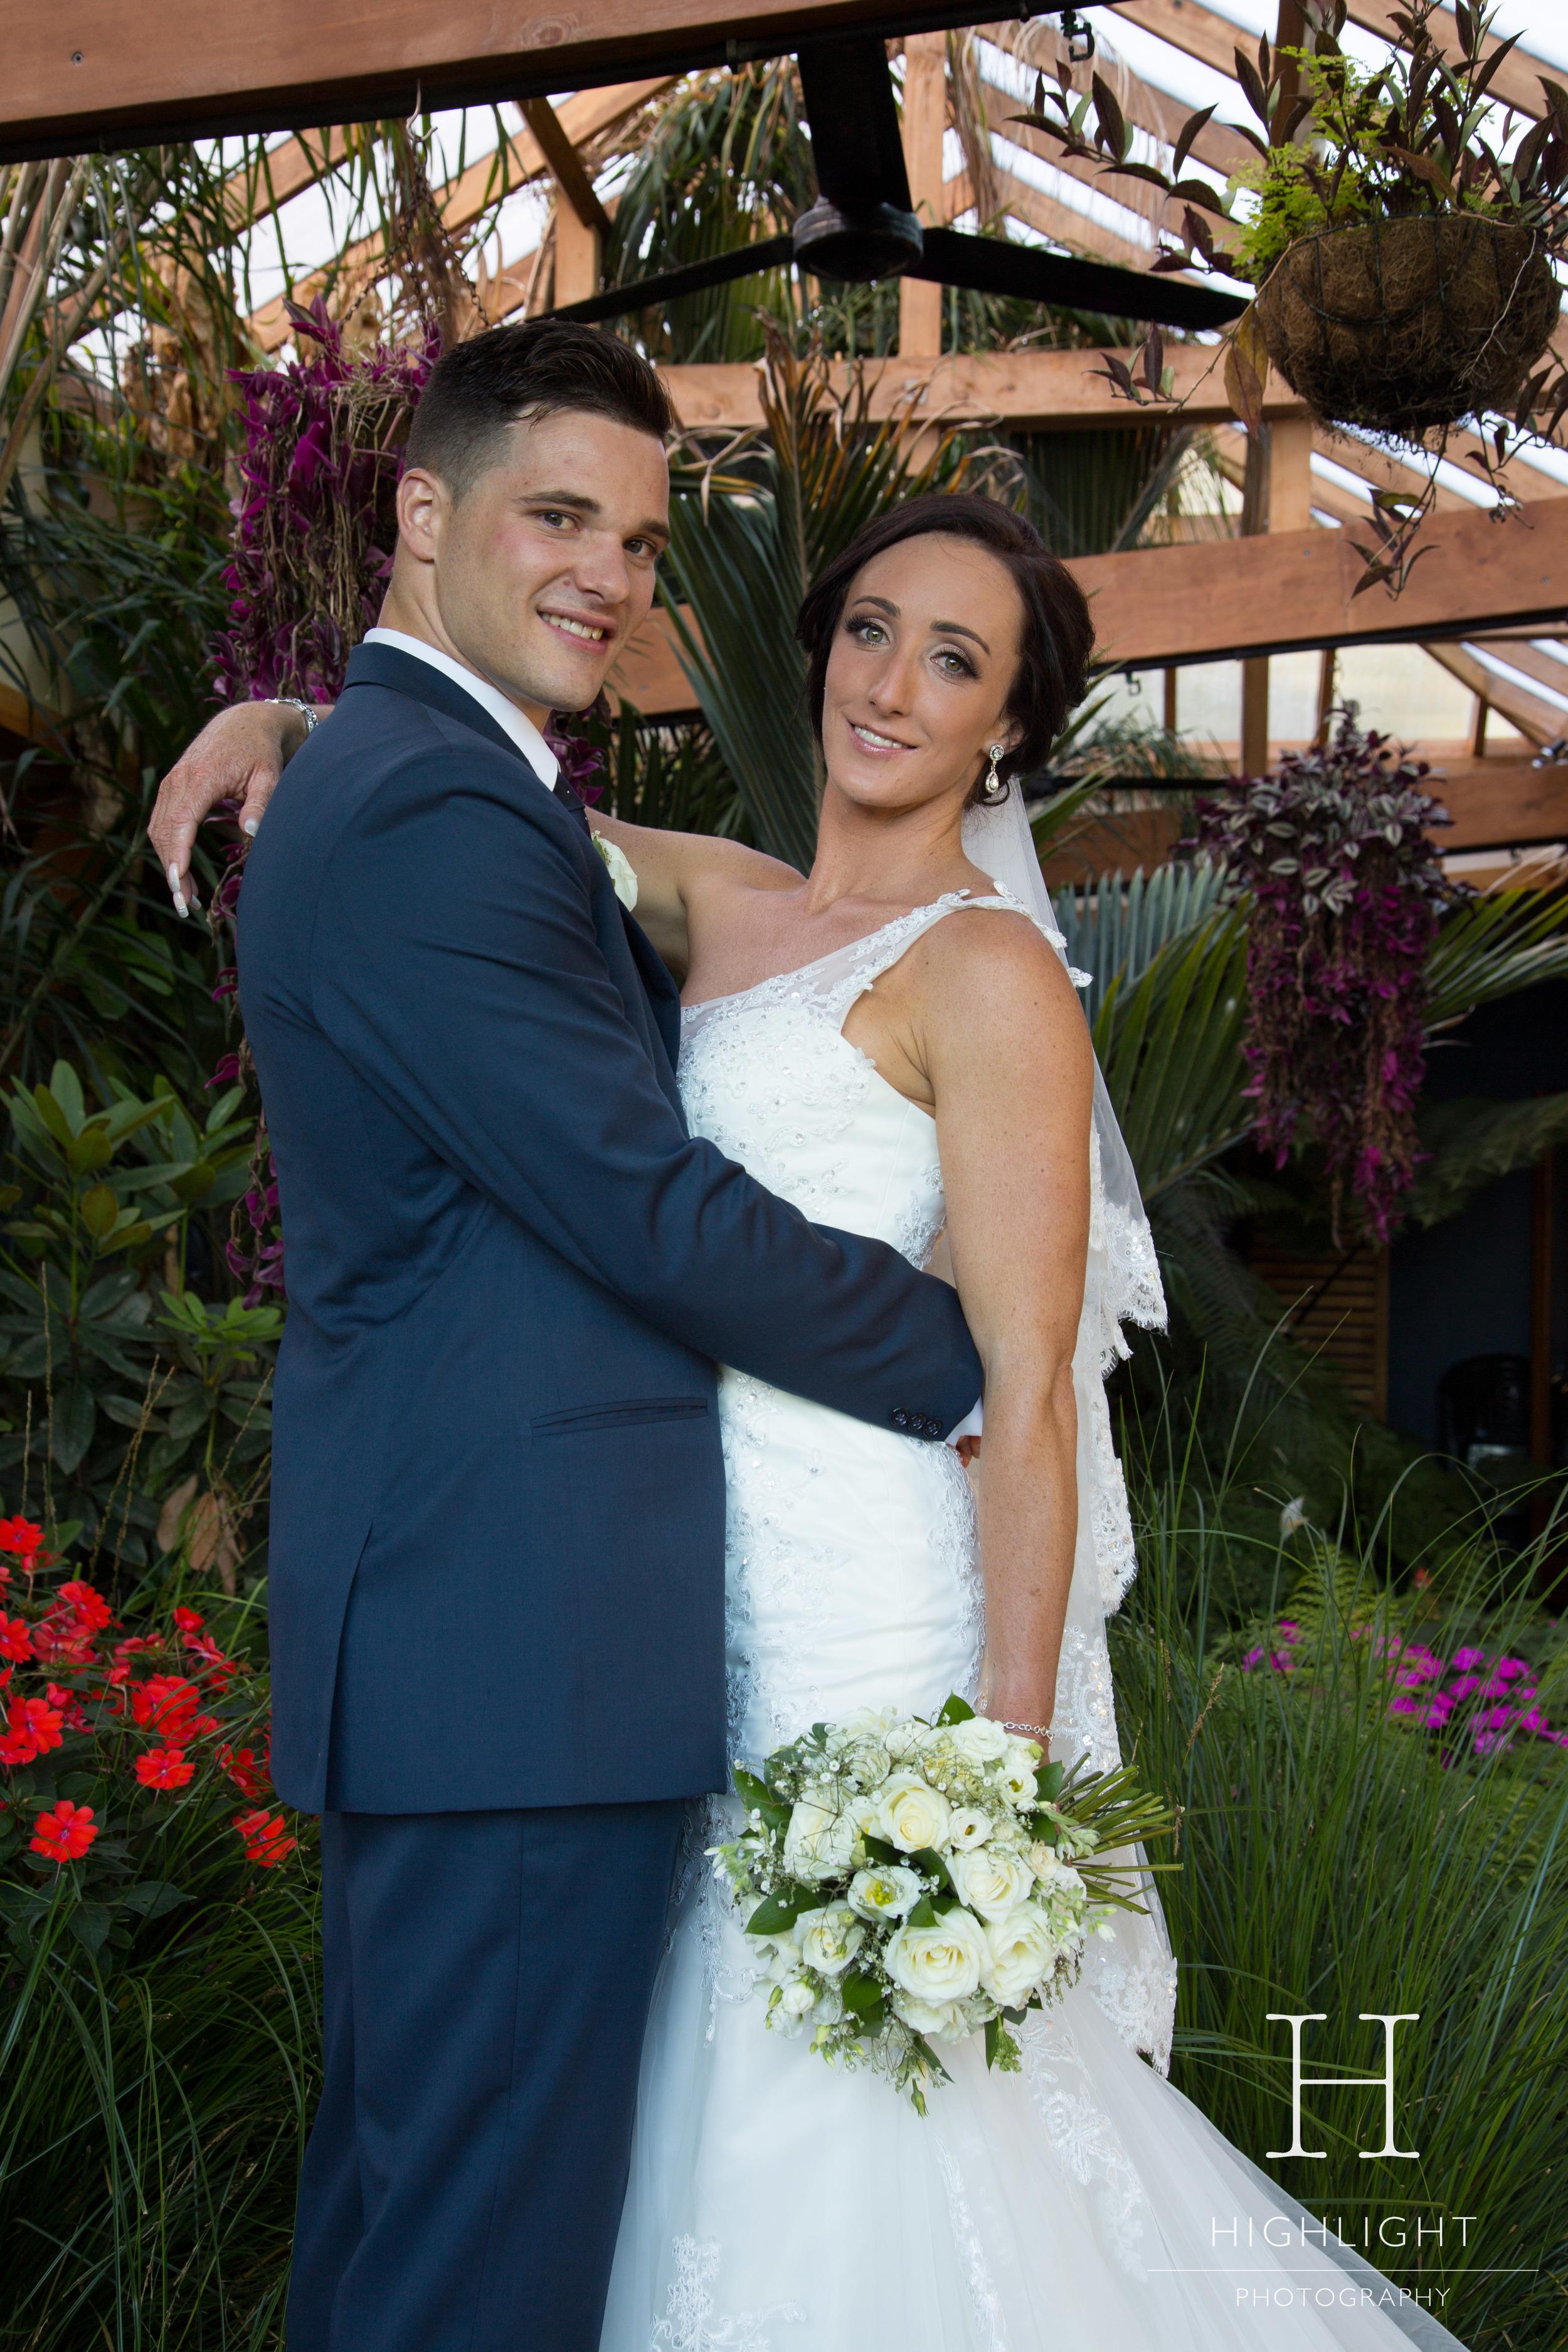 highlight_kc_couple_wedding.jpg